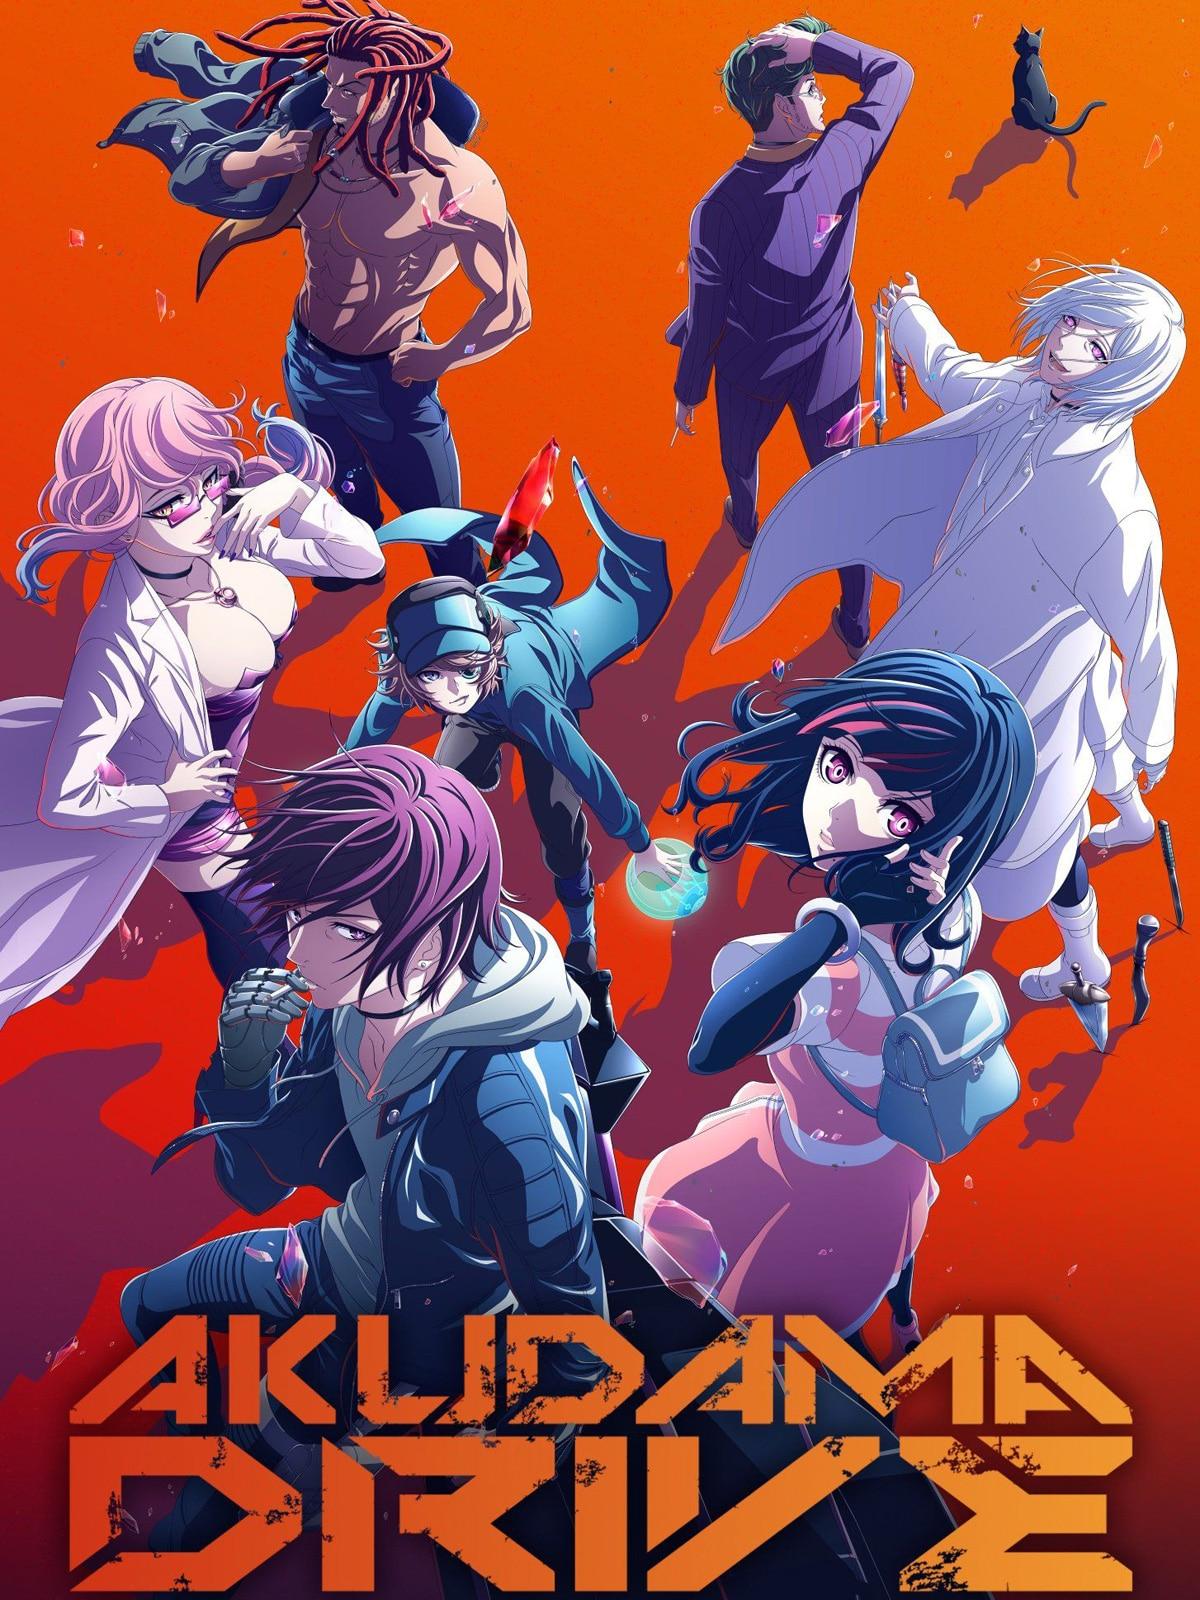 Affiche de l'anime Akudama Drive